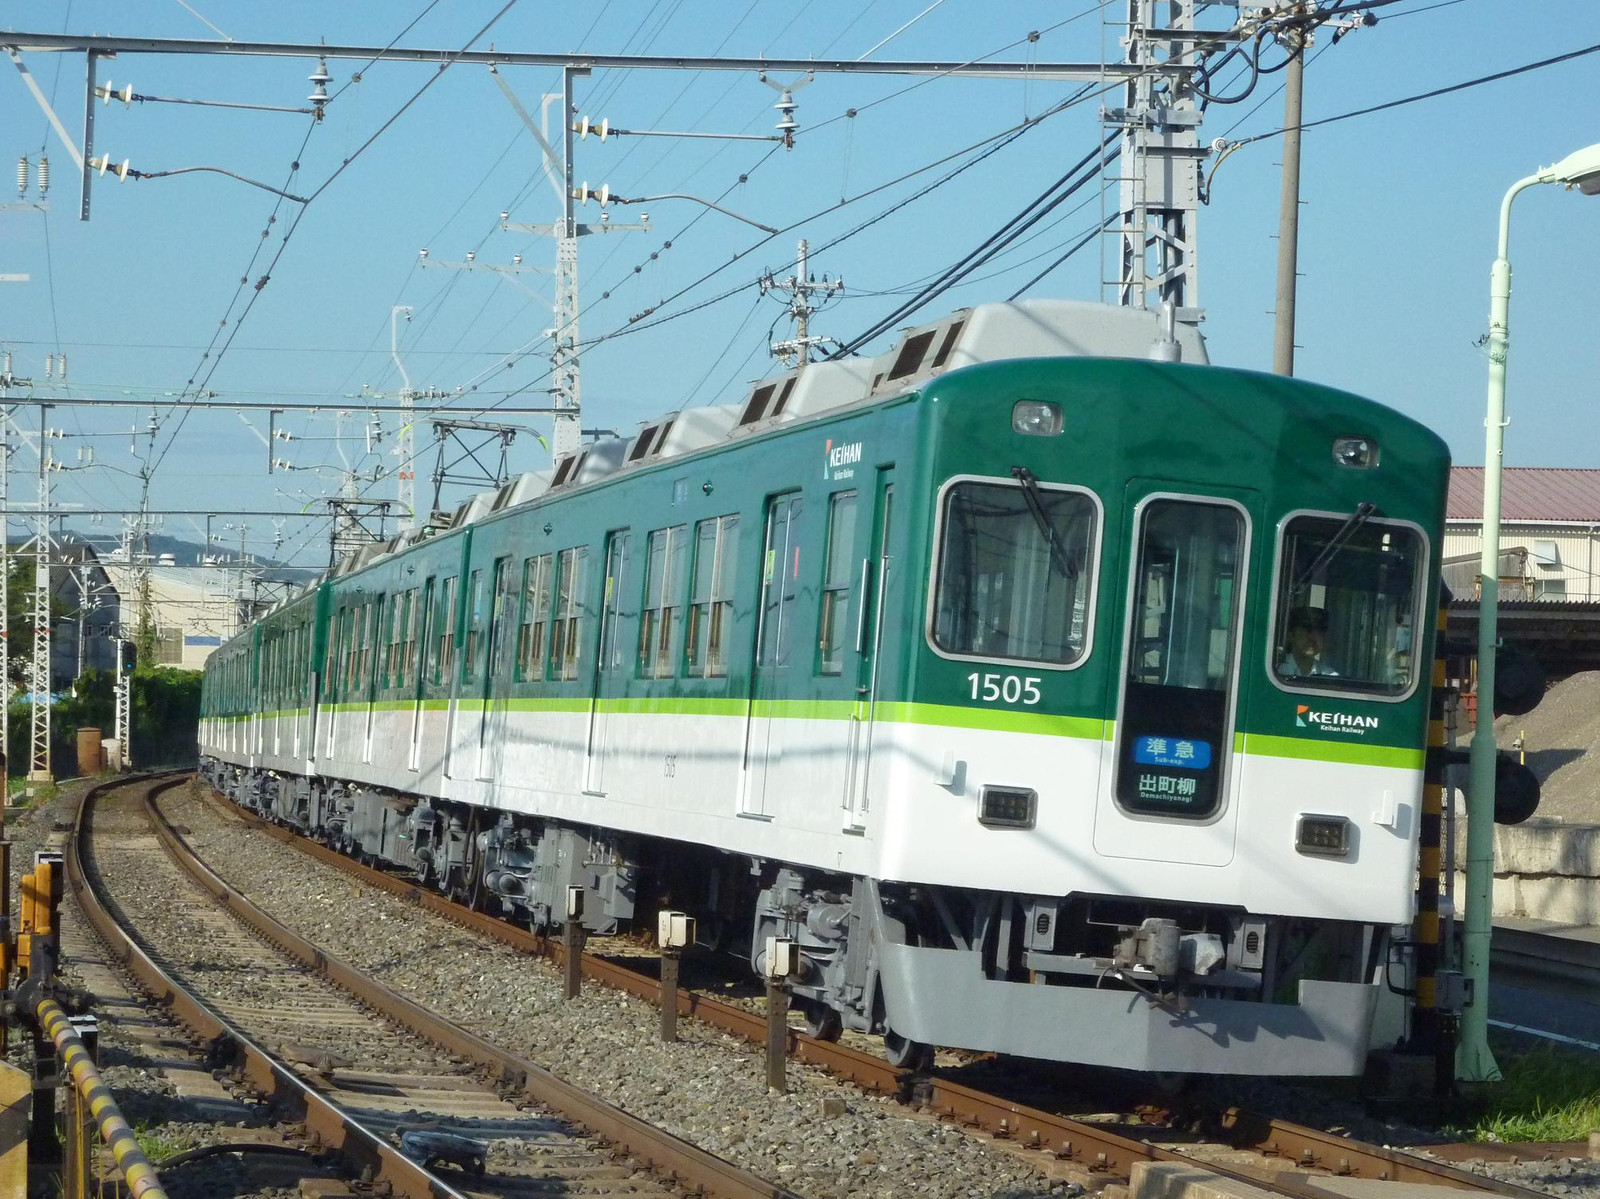 P1050337